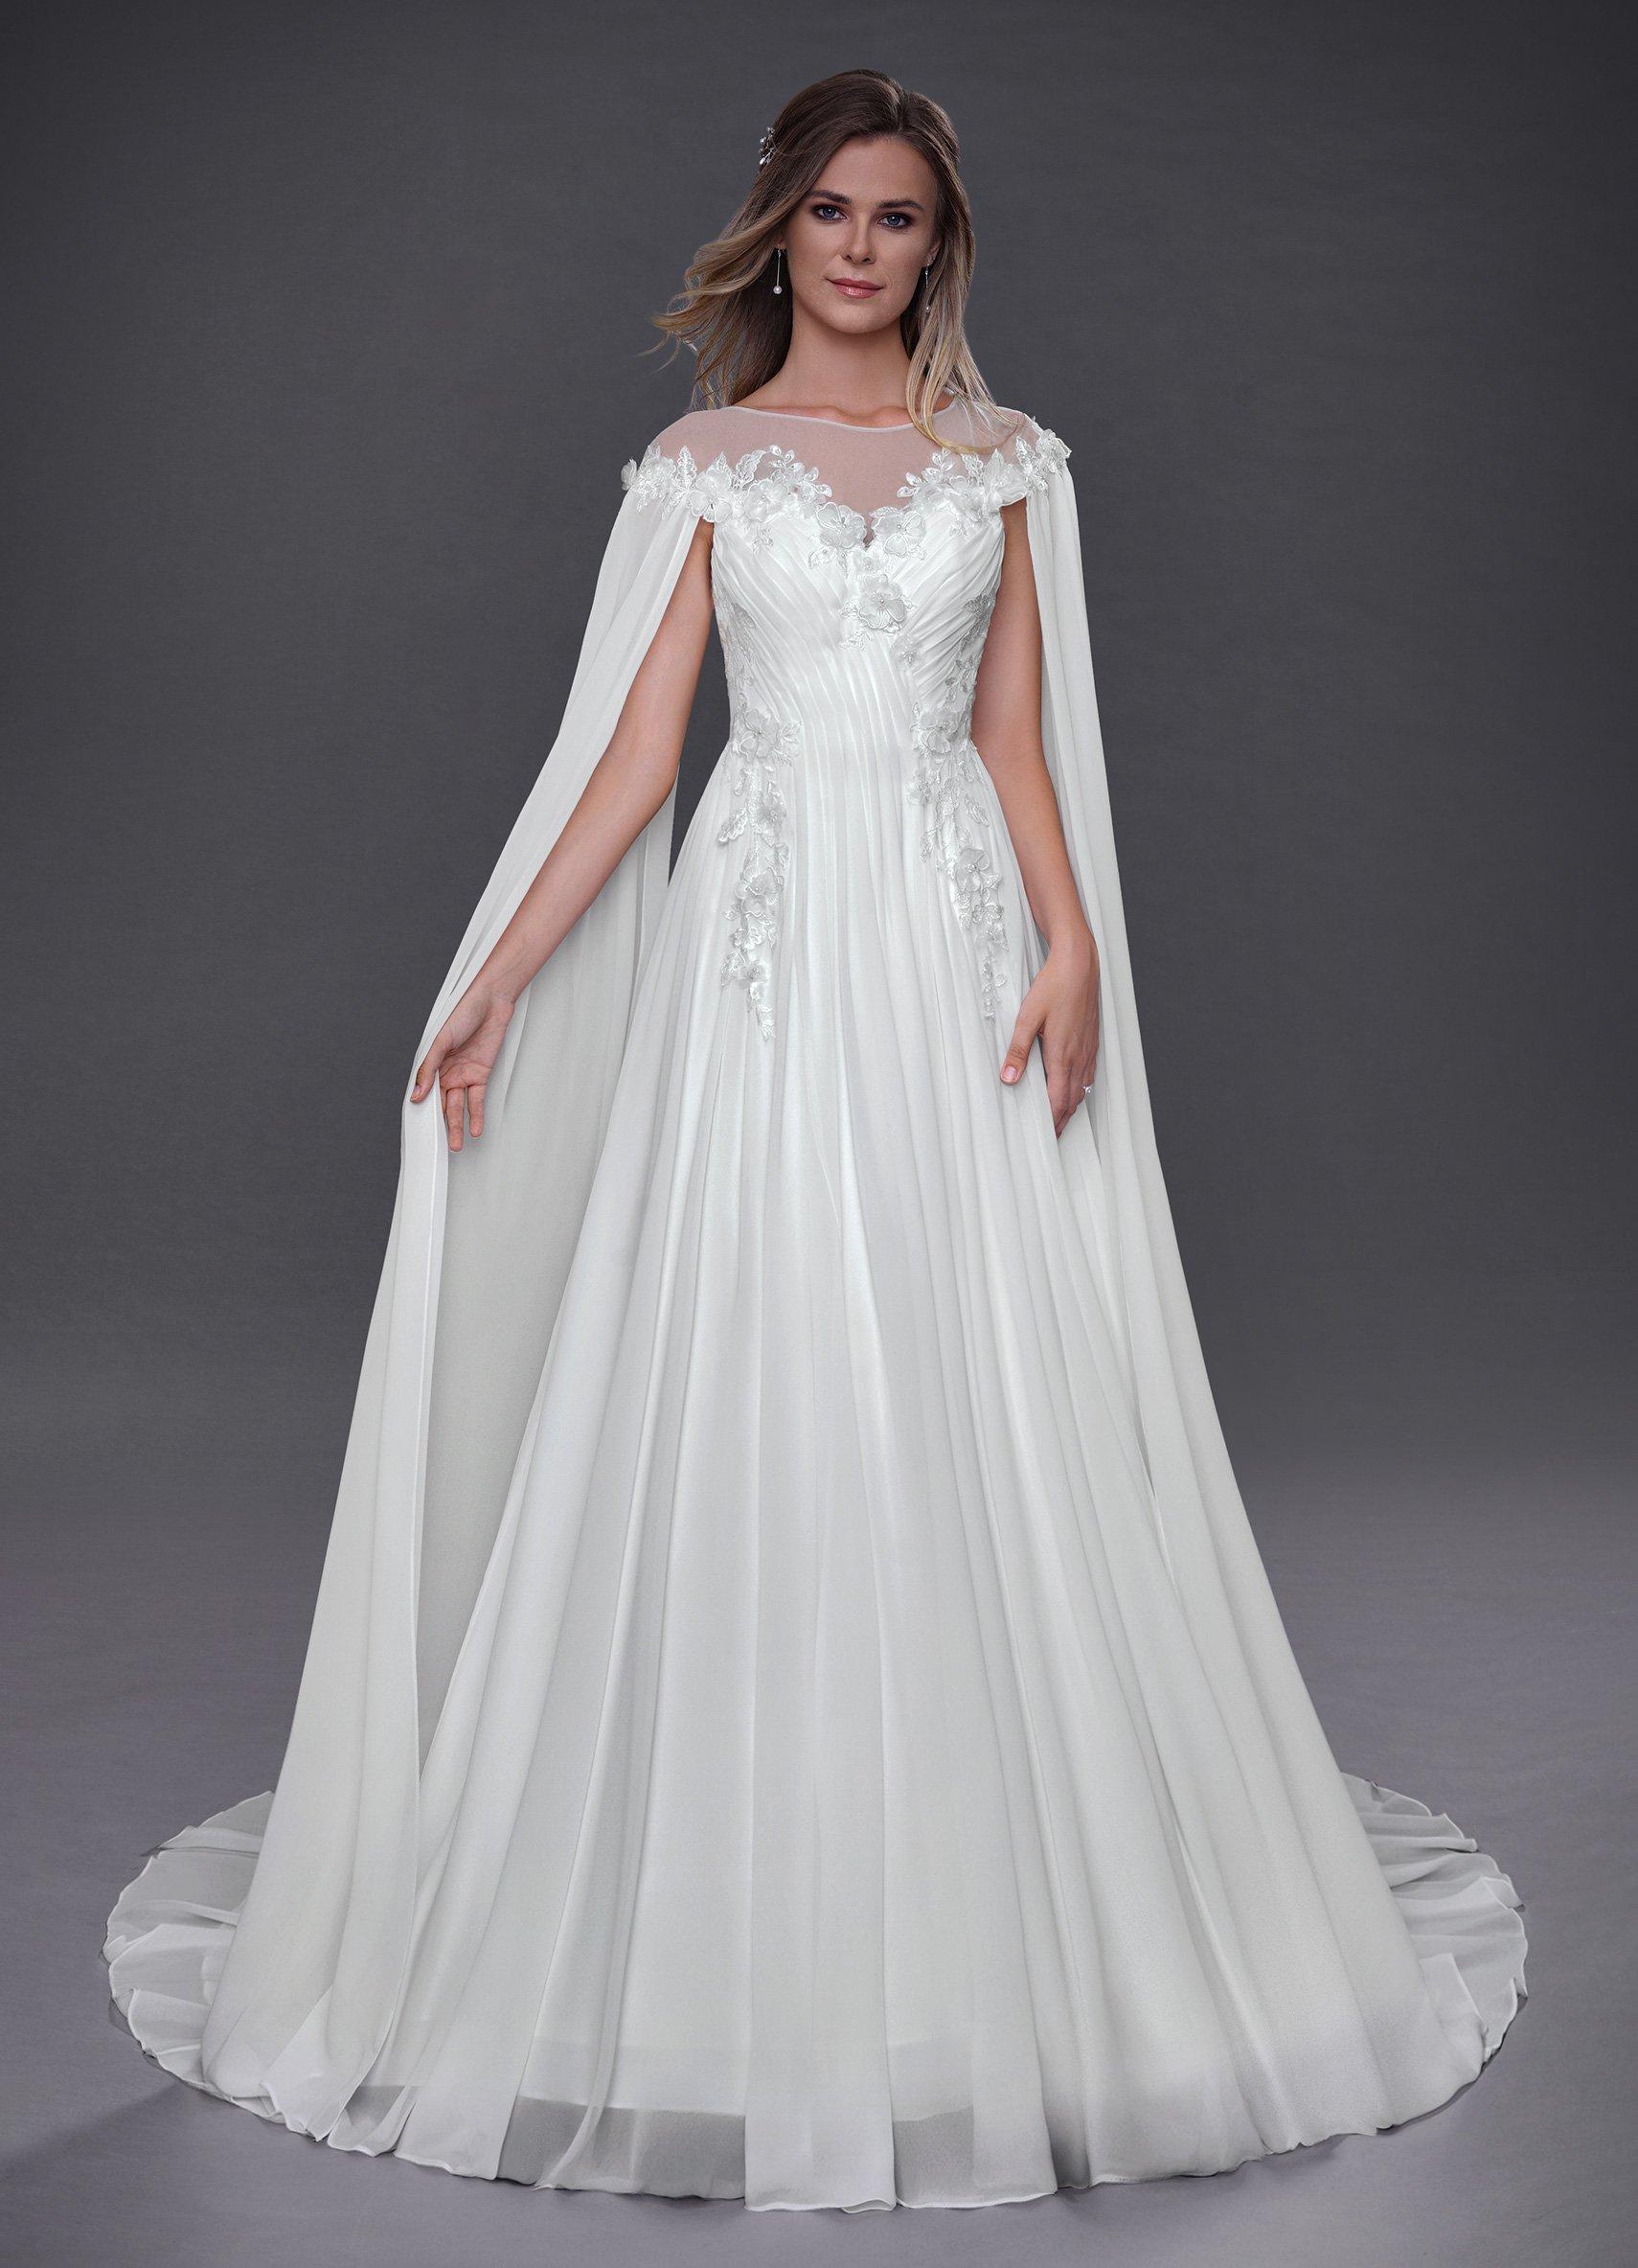 Shapely Fall Fashion 2020 Dresses